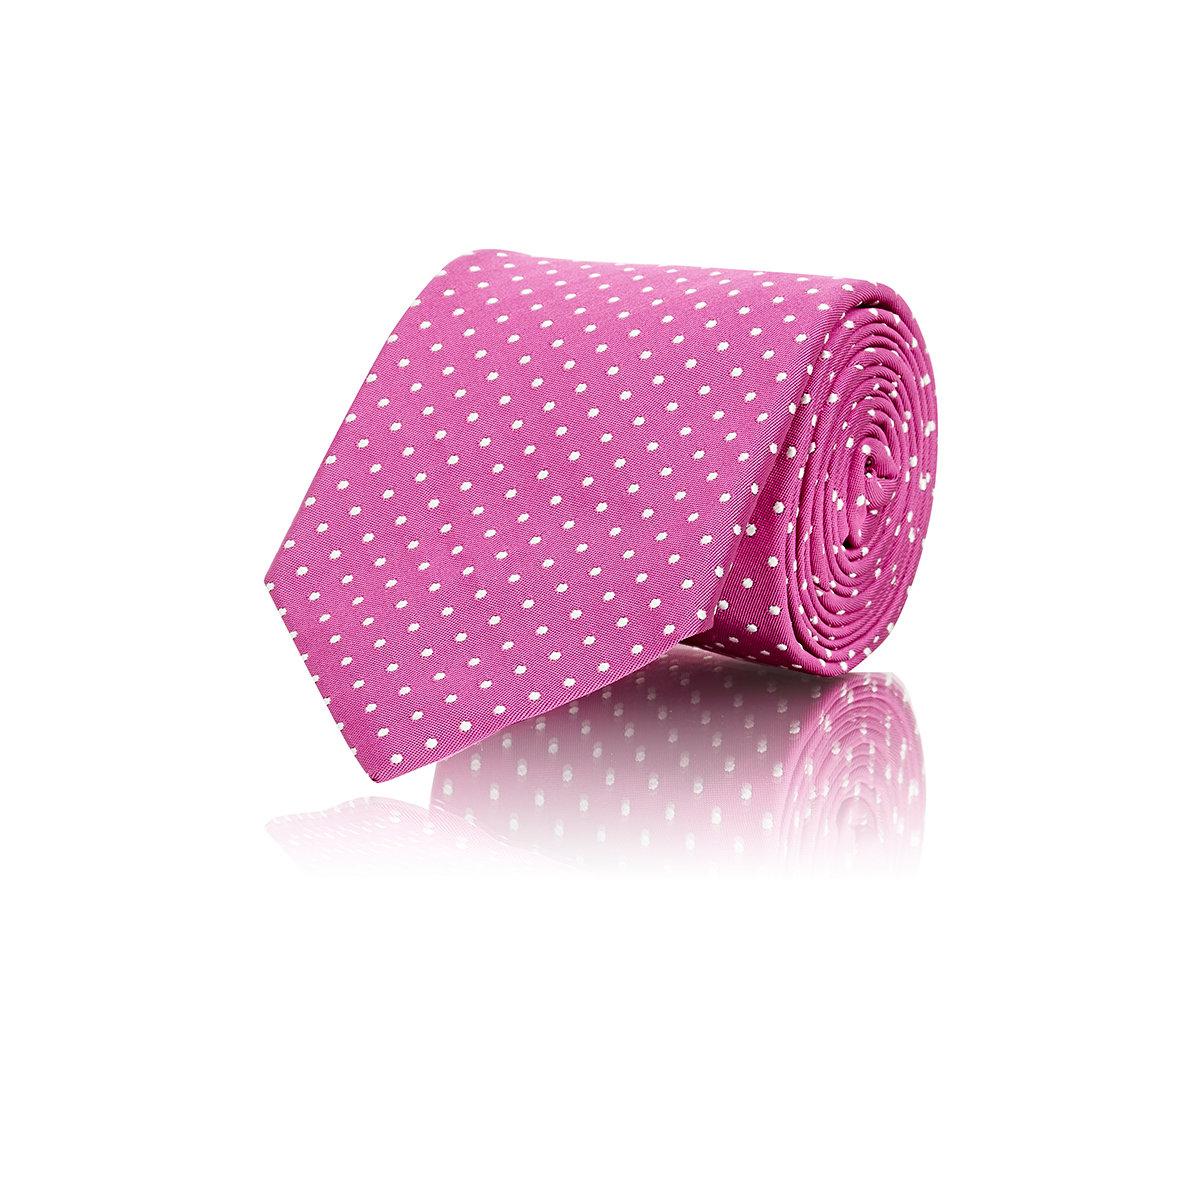 lyst ralph lauren purple label men 39 s dot woven peau de soie necktie in pink for men. Black Bedroom Furniture Sets. Home Design Ideas